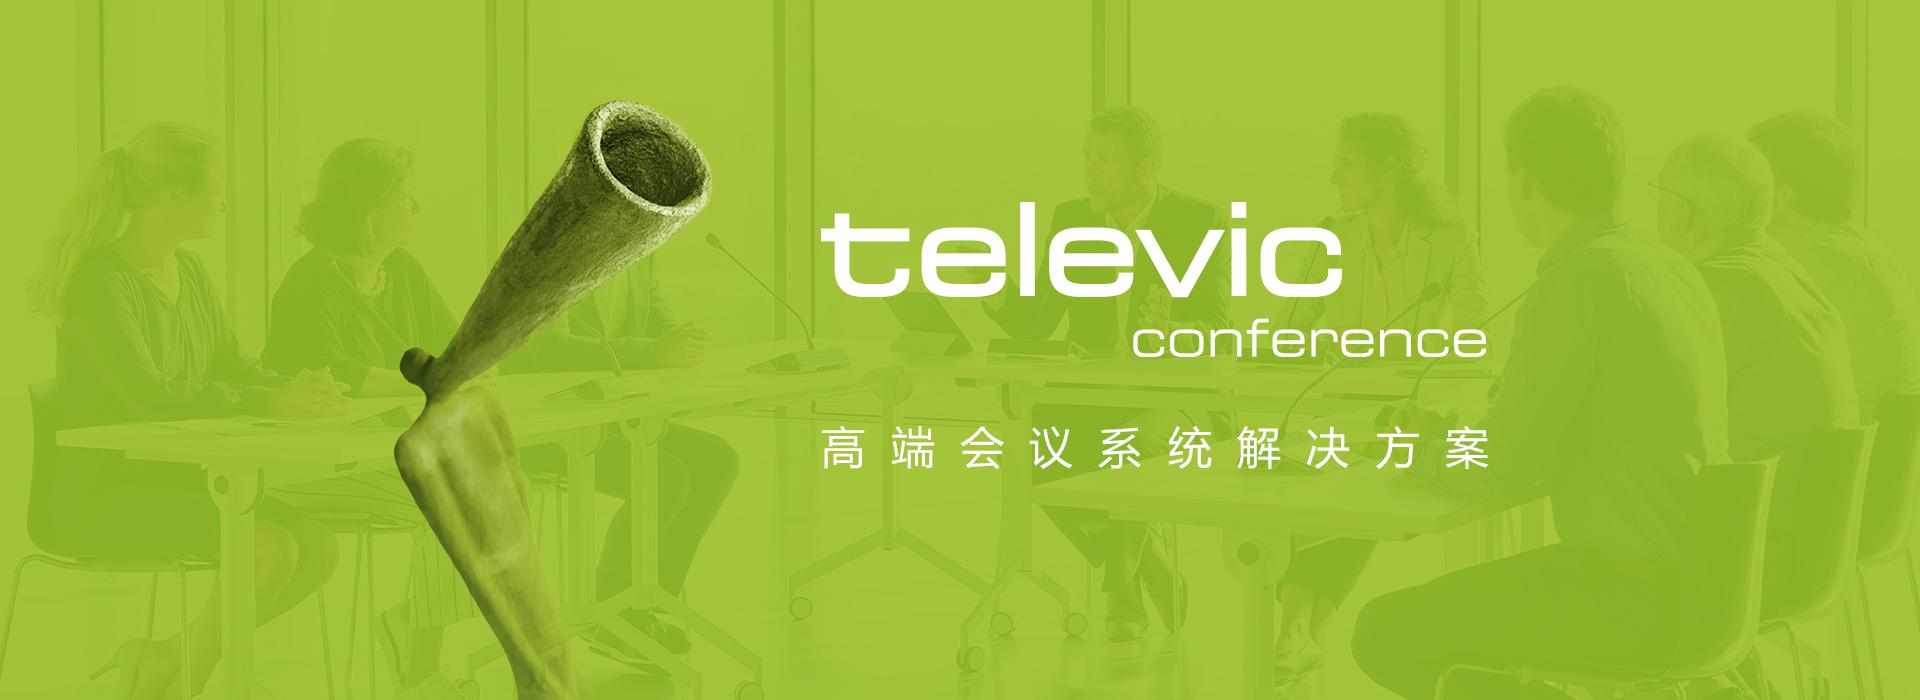 televic高端会议解决方案